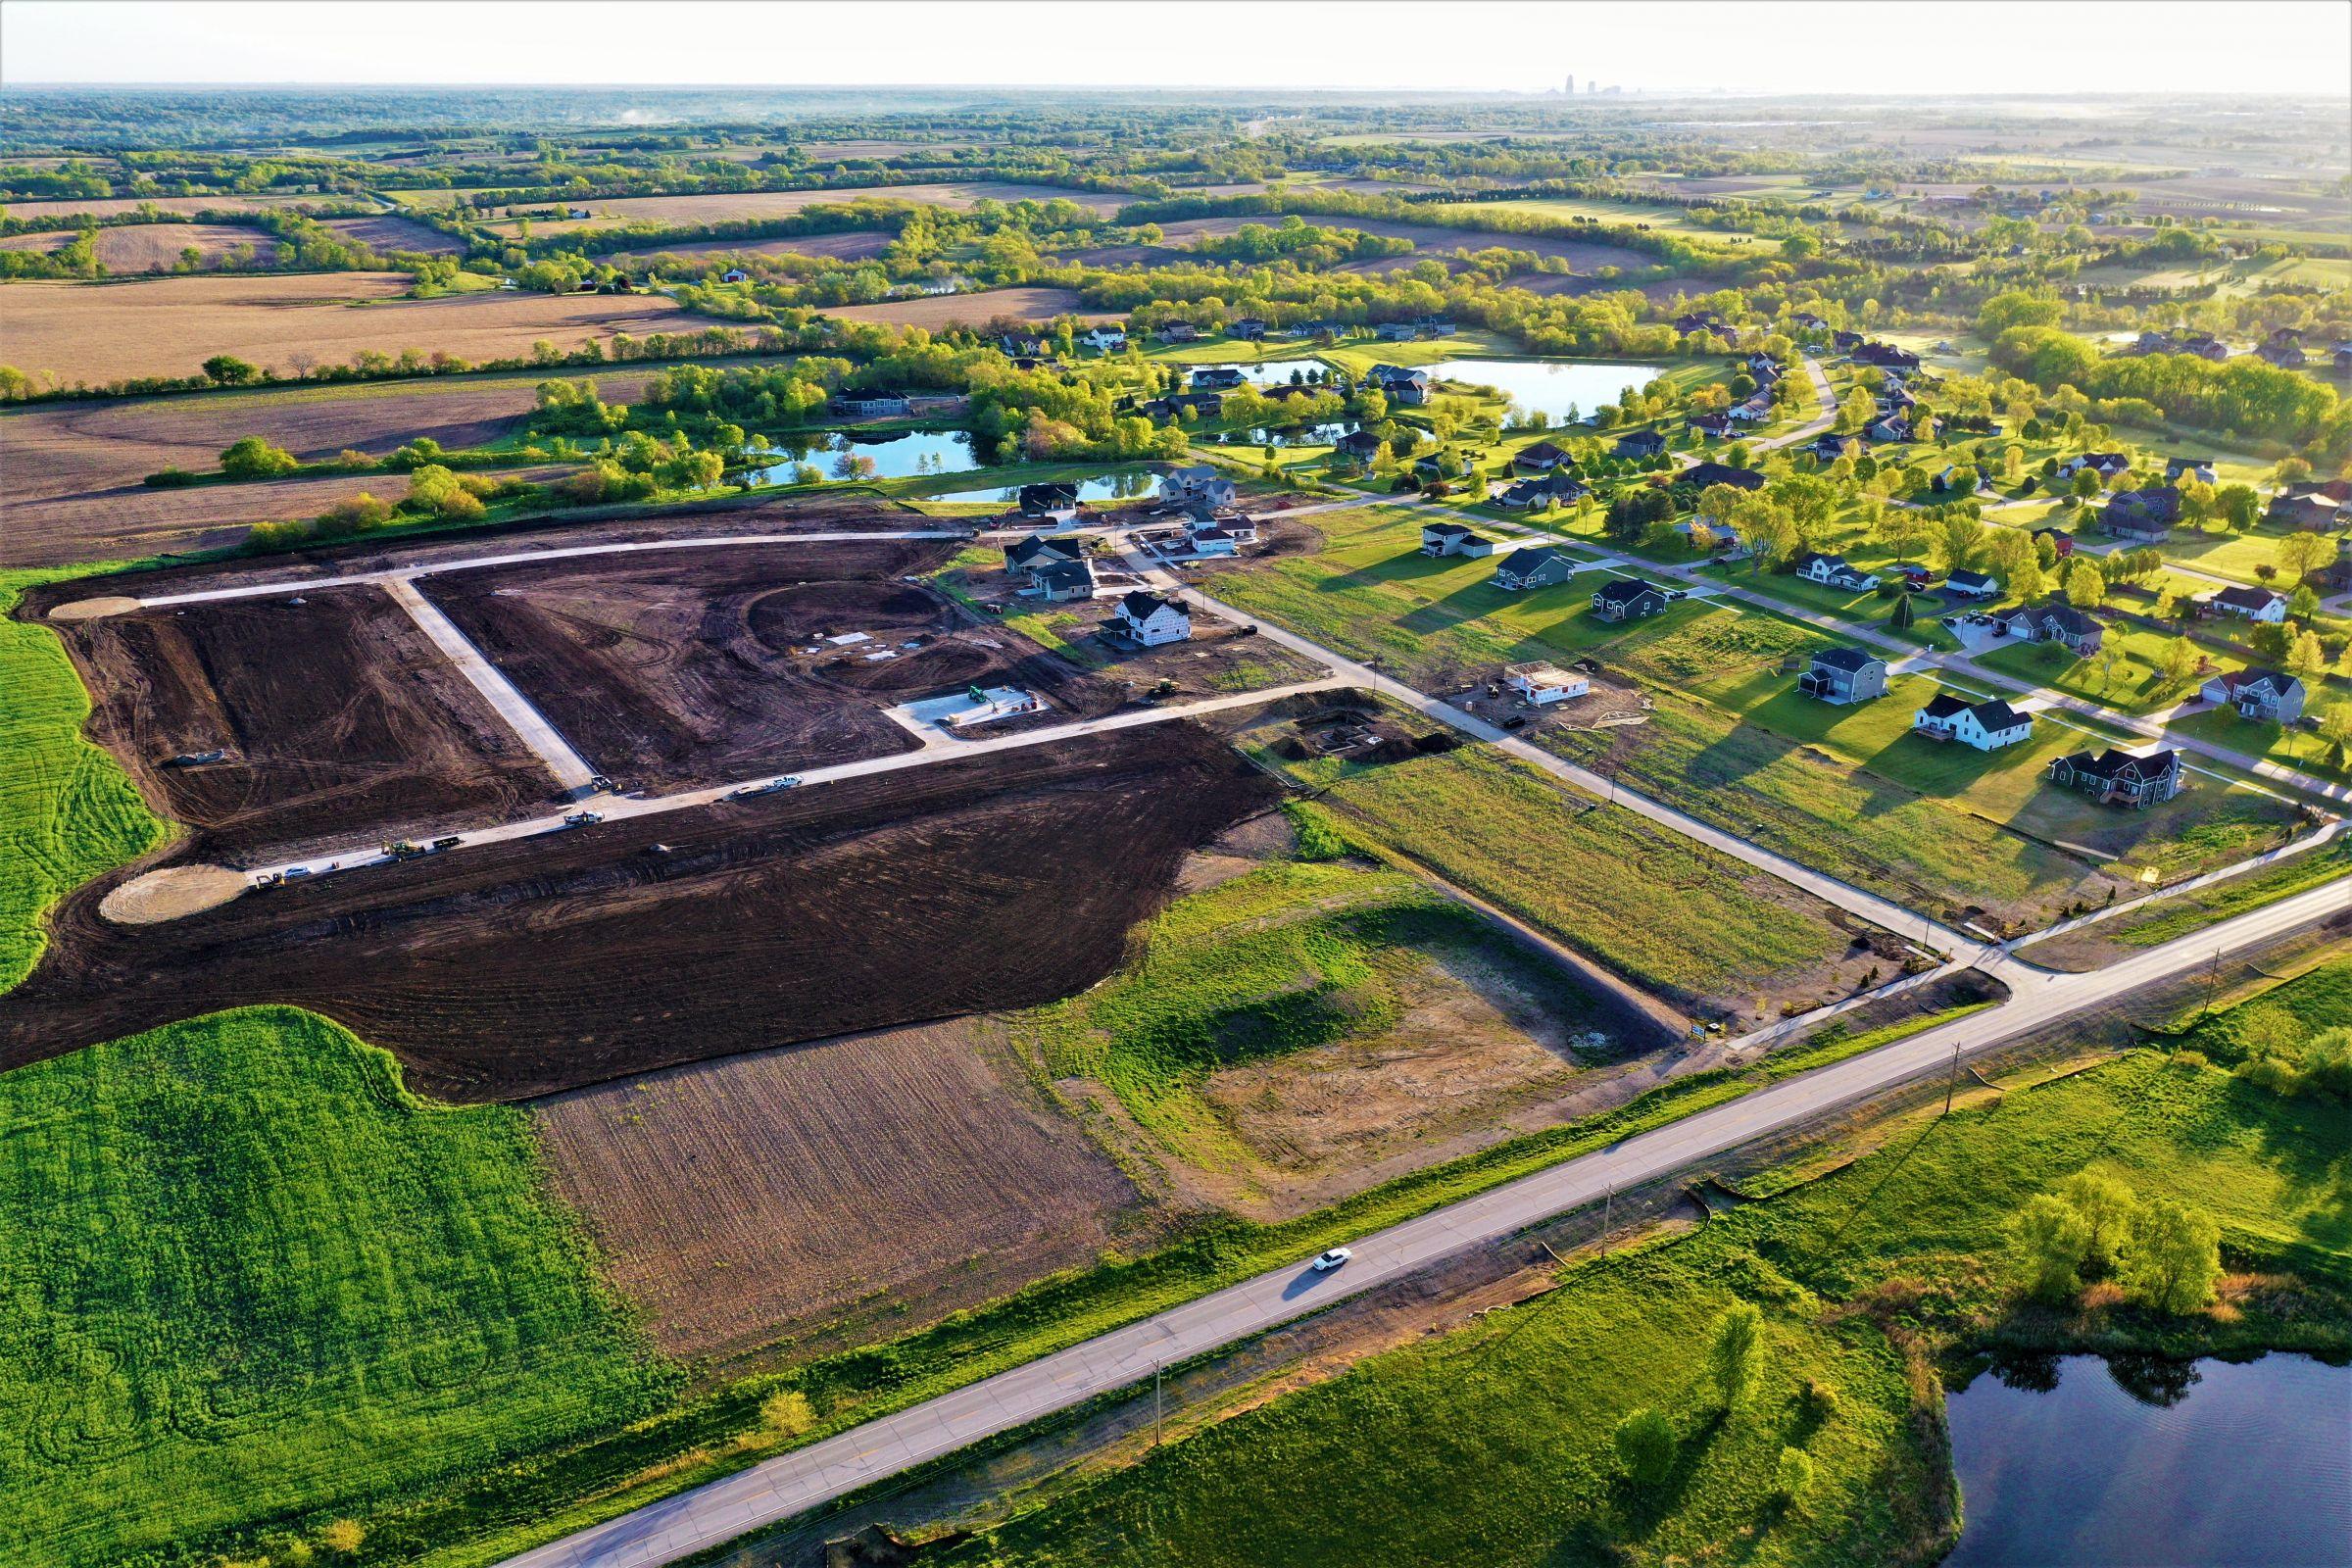 development-land-warren-county-iowa-0-acres-listing-number-14249-0-2021-07-09-171727.JPG